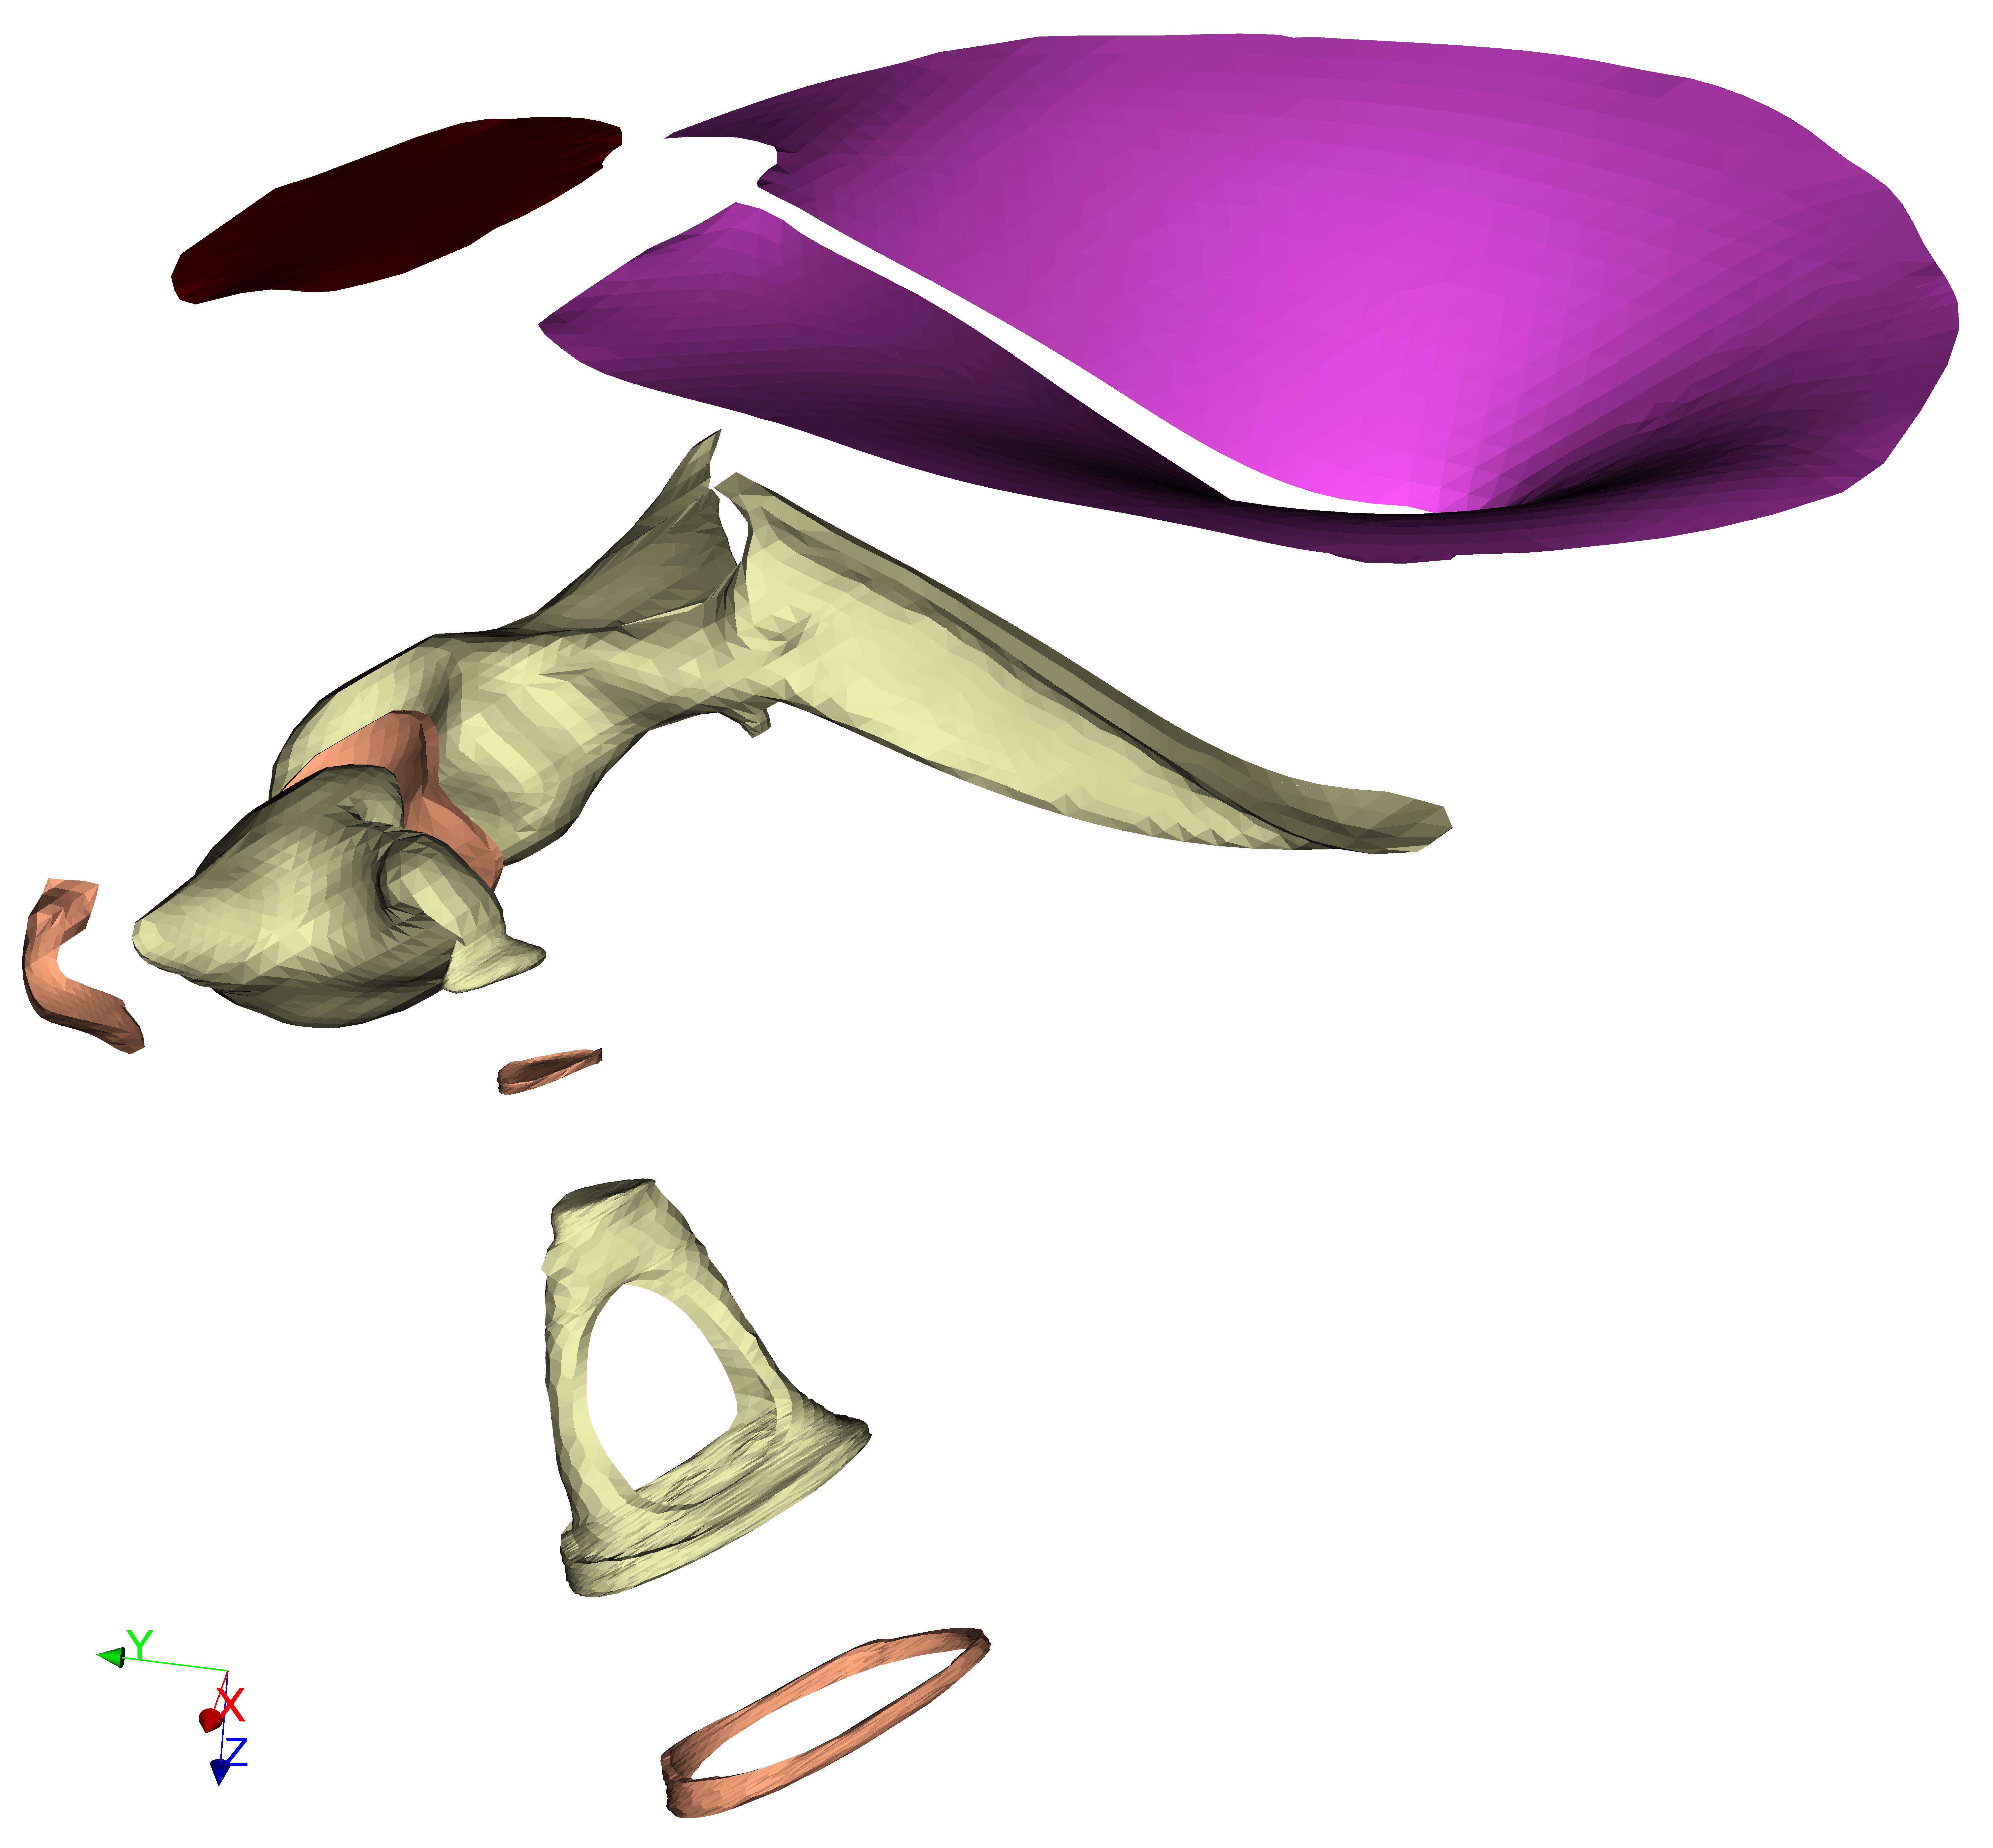 AudiLab software: Modelling: Fie.